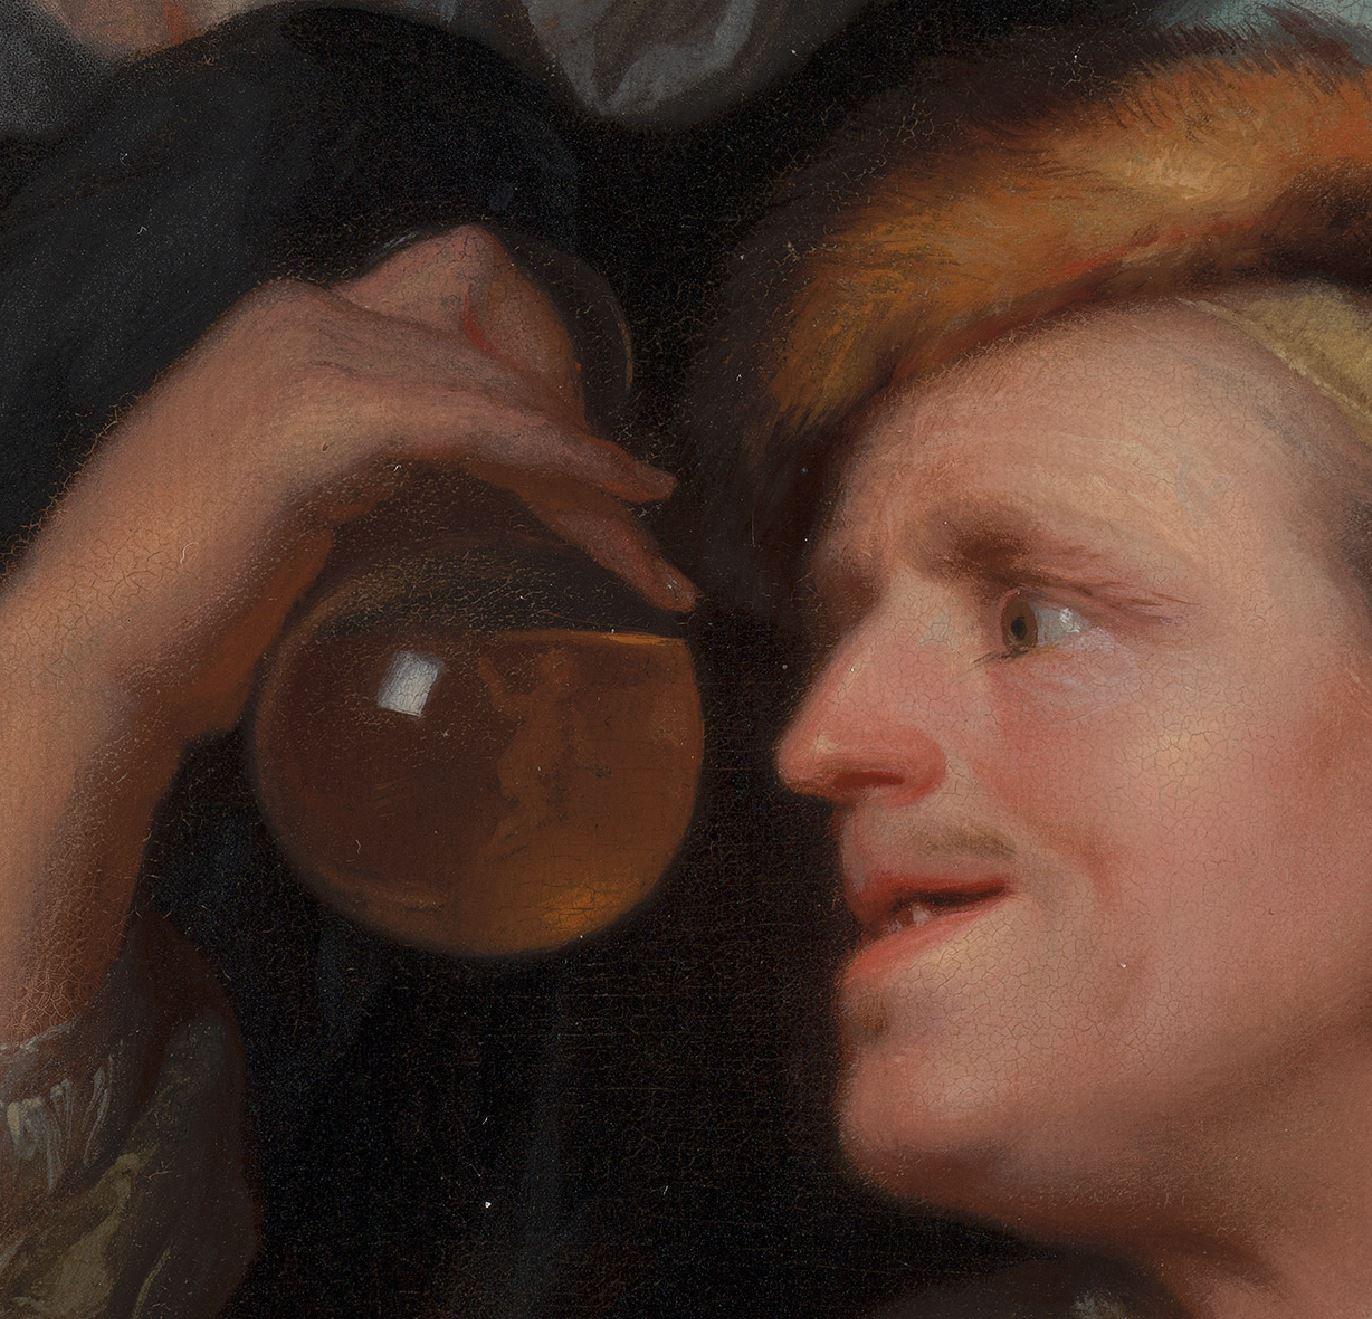 Schalcken 1690 ca The Medical Examination Mauritshuis detail